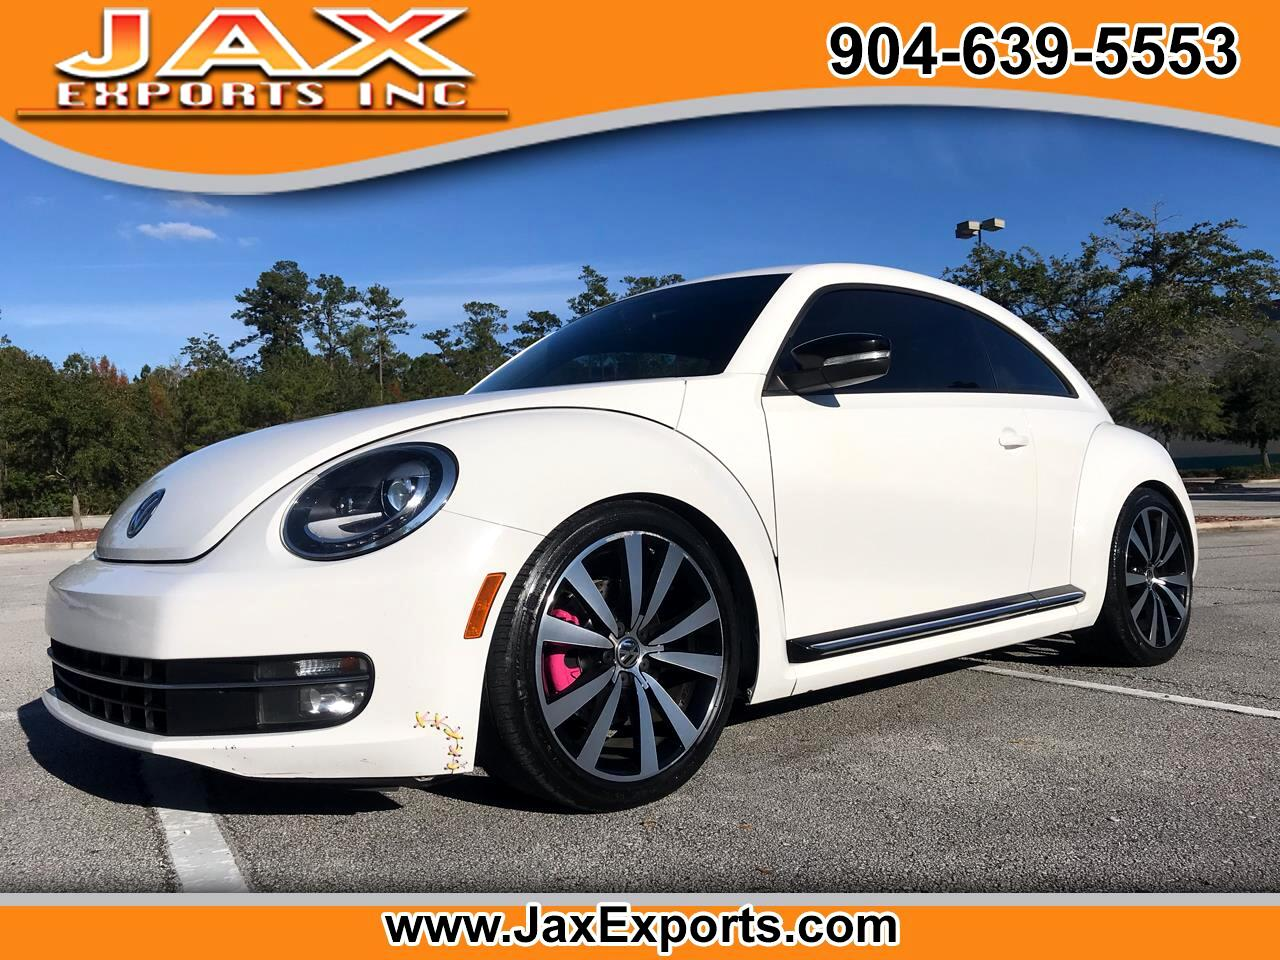 2012 Volkswagen Beetle 2dr Cpe Man 2.0T Turbo